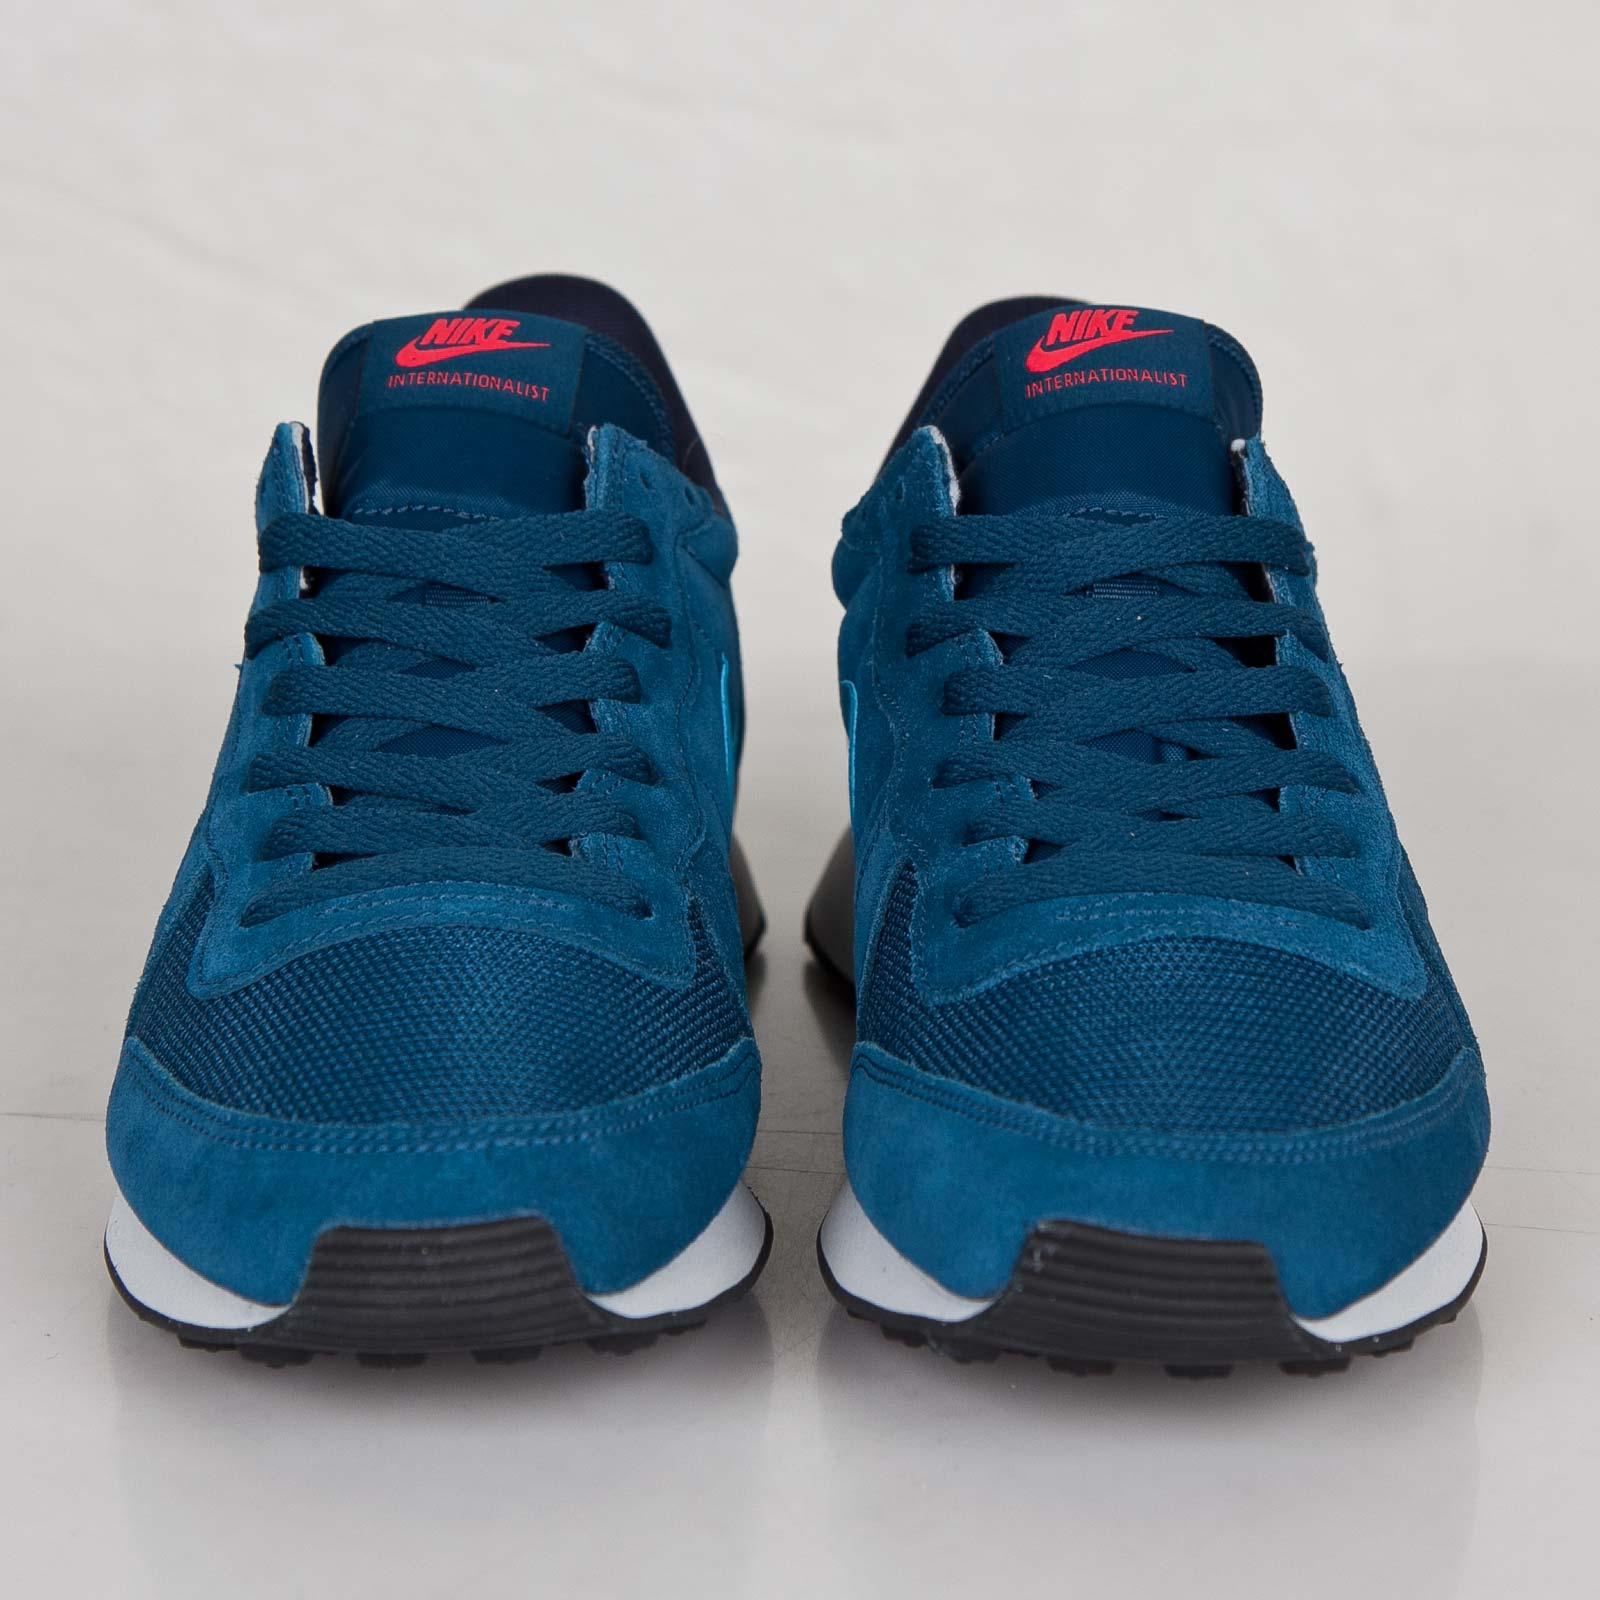 save off 94f74 4e71f Nike Internationalist Leather - 631755-401 - Sneakersnstuff I Sneakers    Streetwear online seit 1999